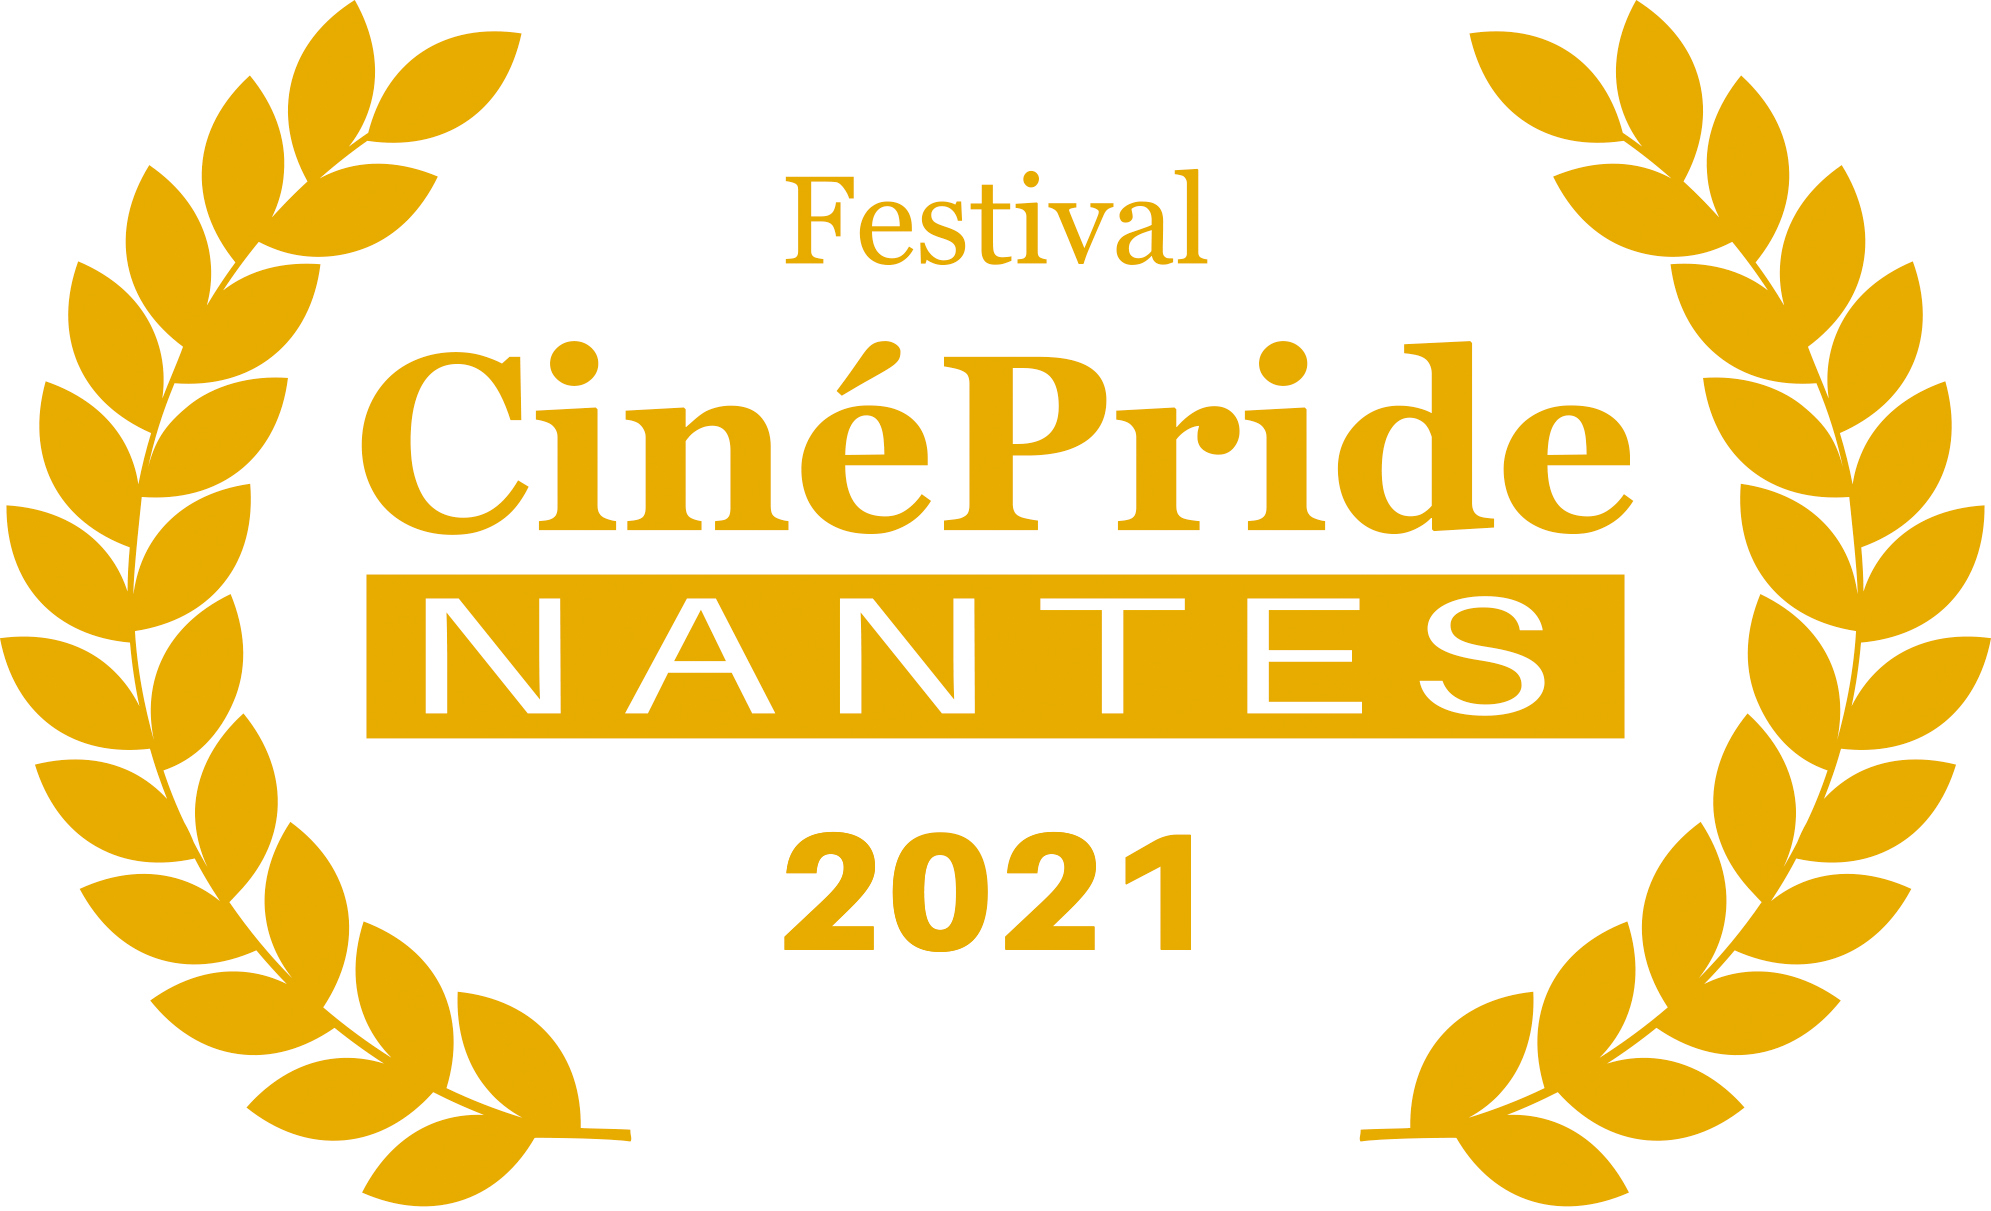 Cinepride Nantes